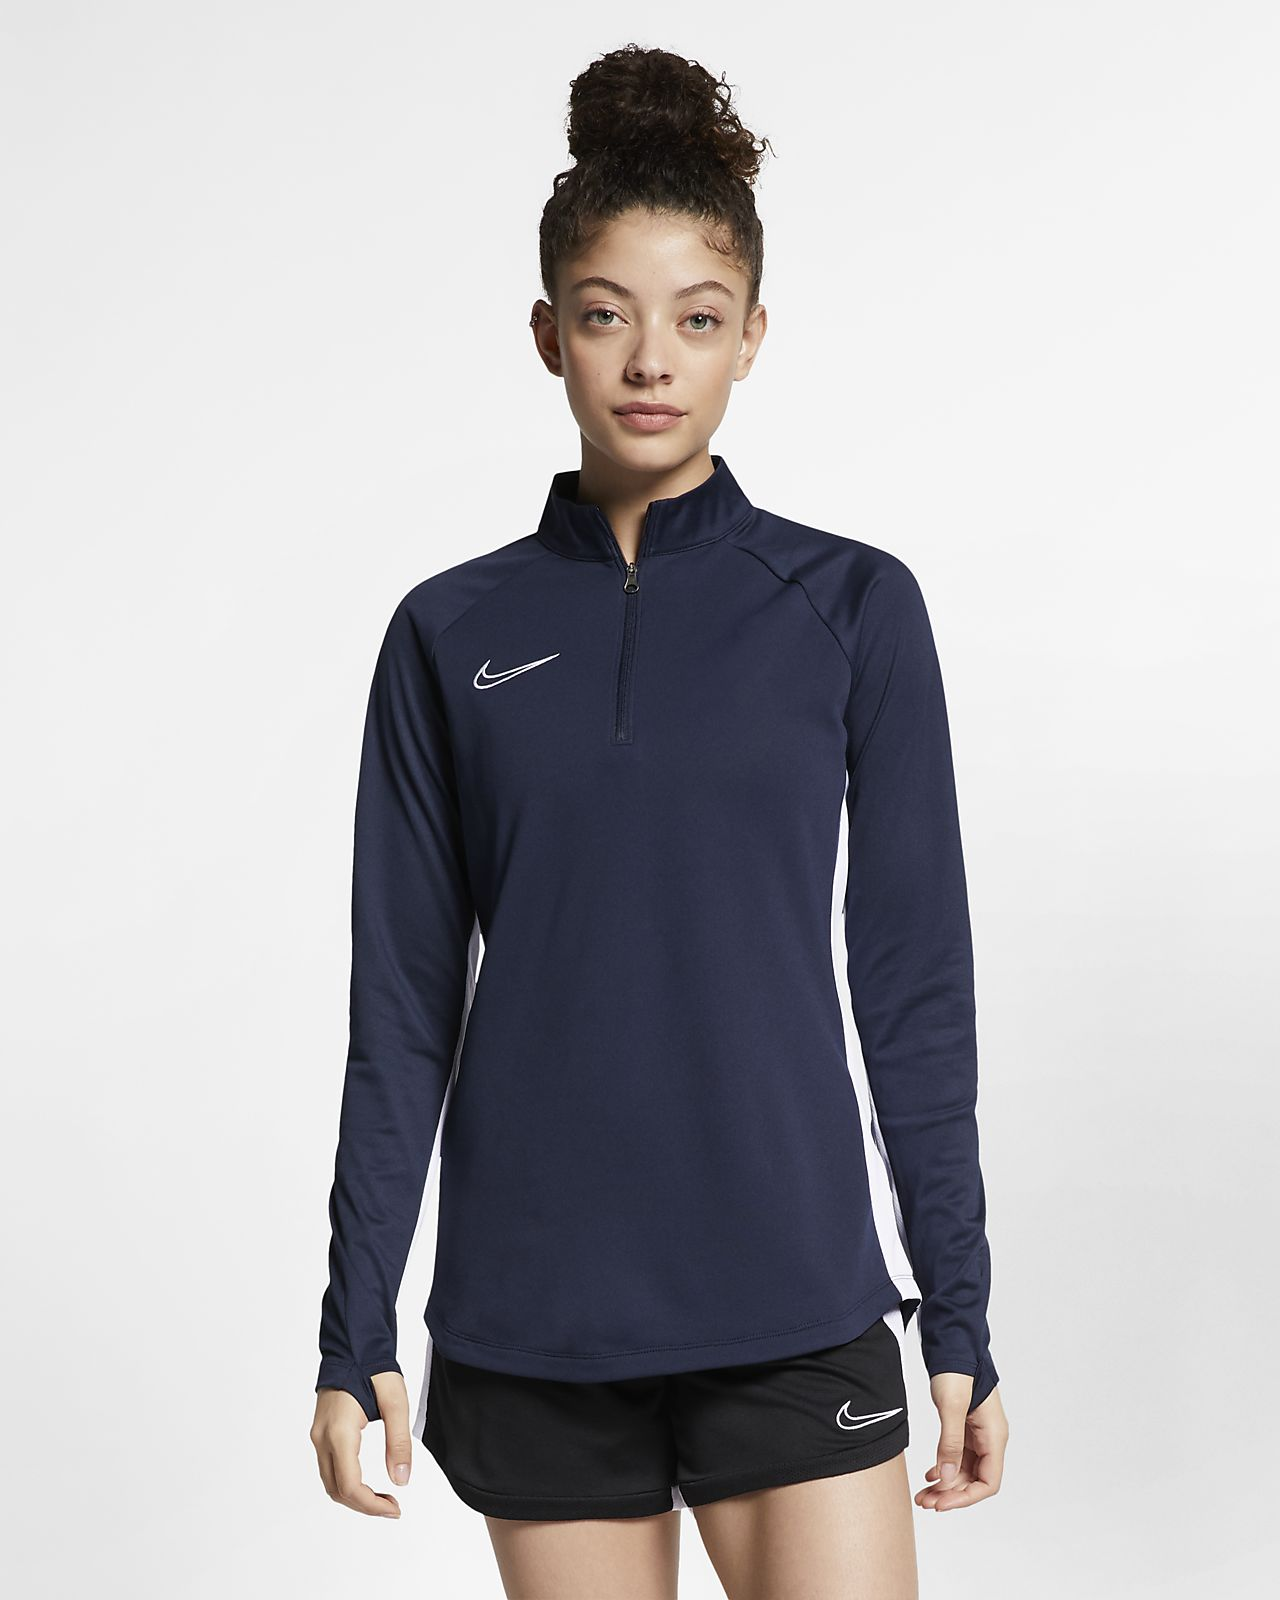 Nike Dri-FIT Academy Women s Soccer Drill Top. Nike.com fb1135514